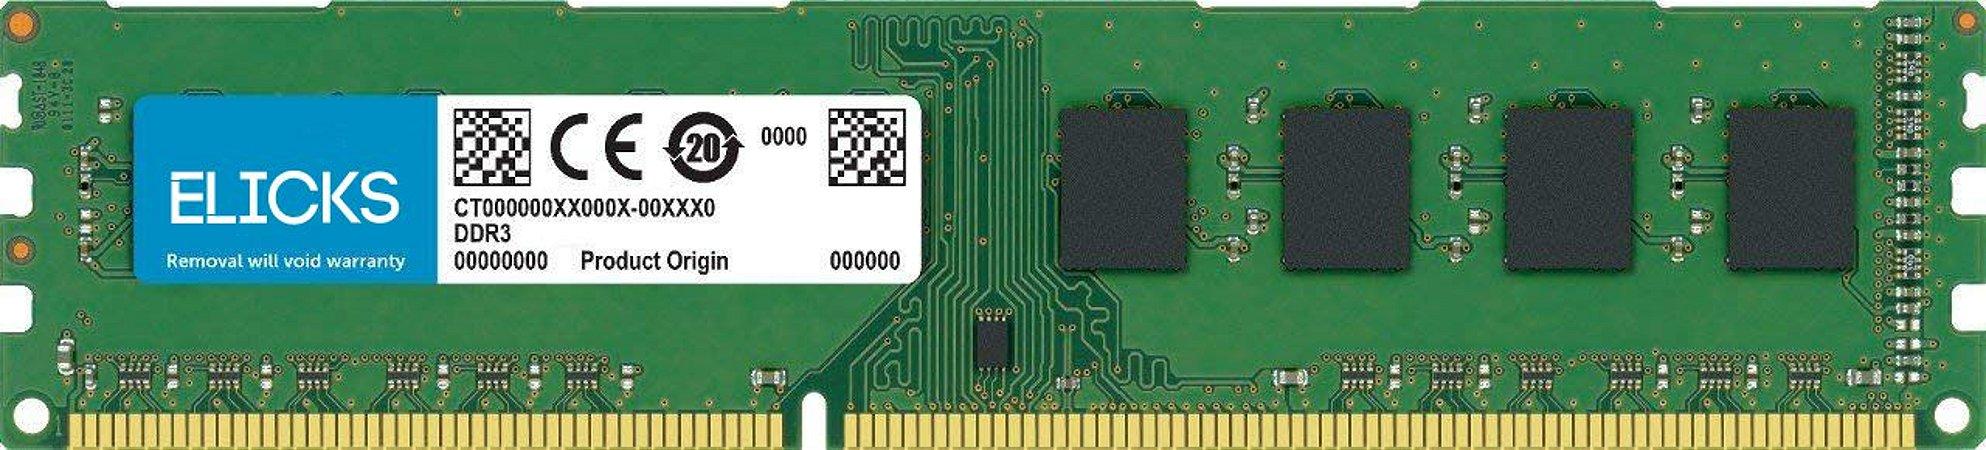 Memoria DDR3 2GB 1333MHz Elicks